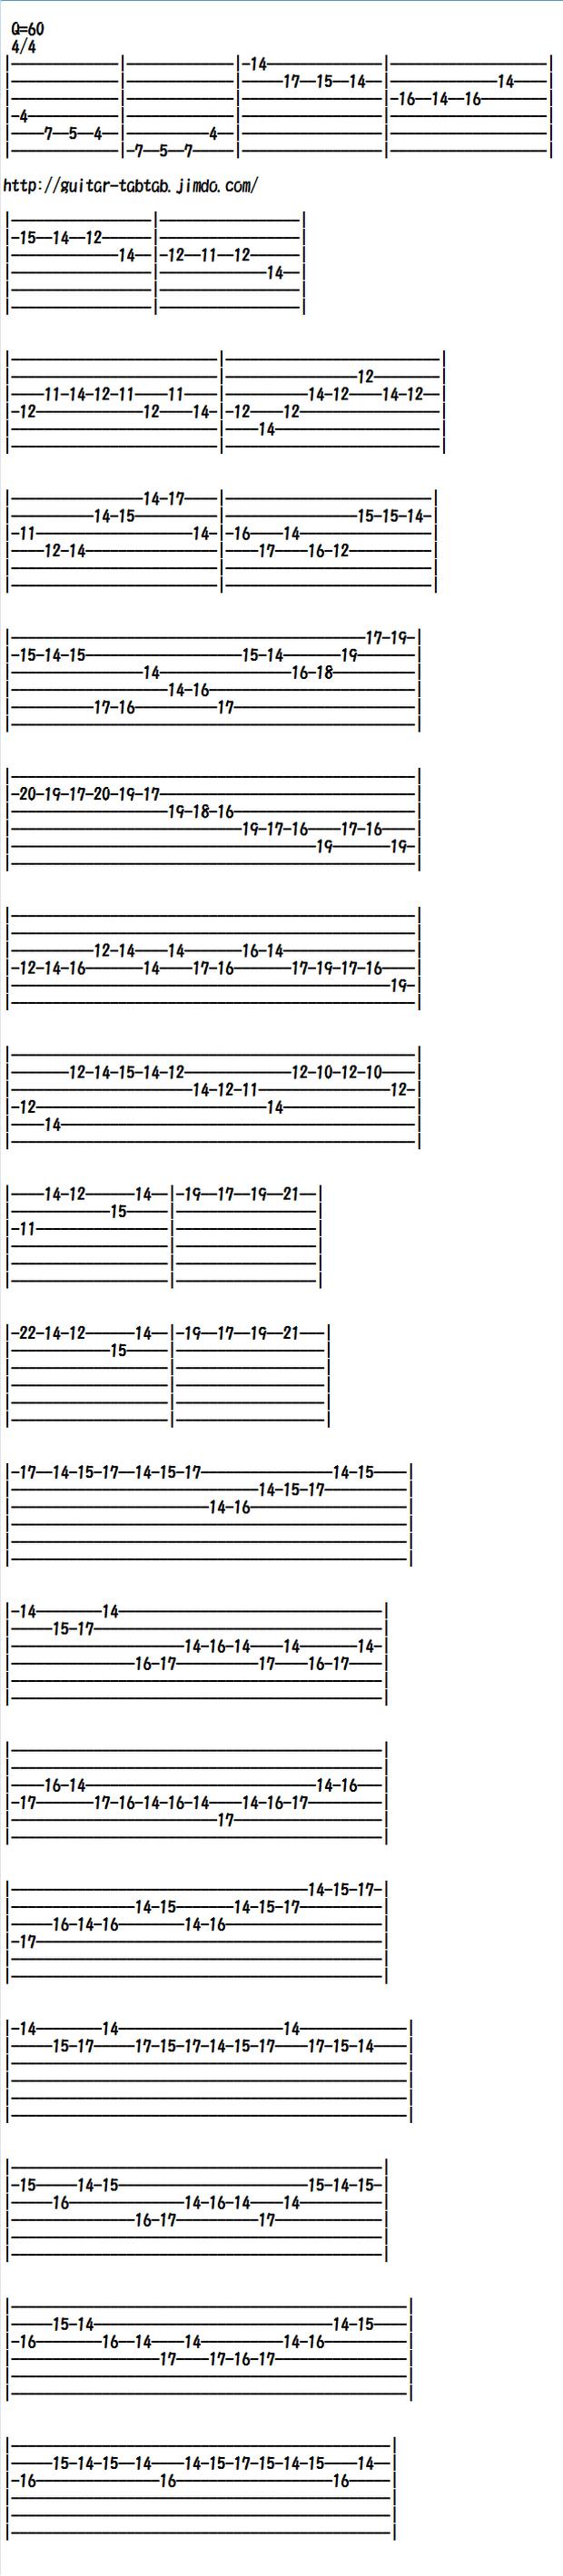 canon in d guitar tab pdf